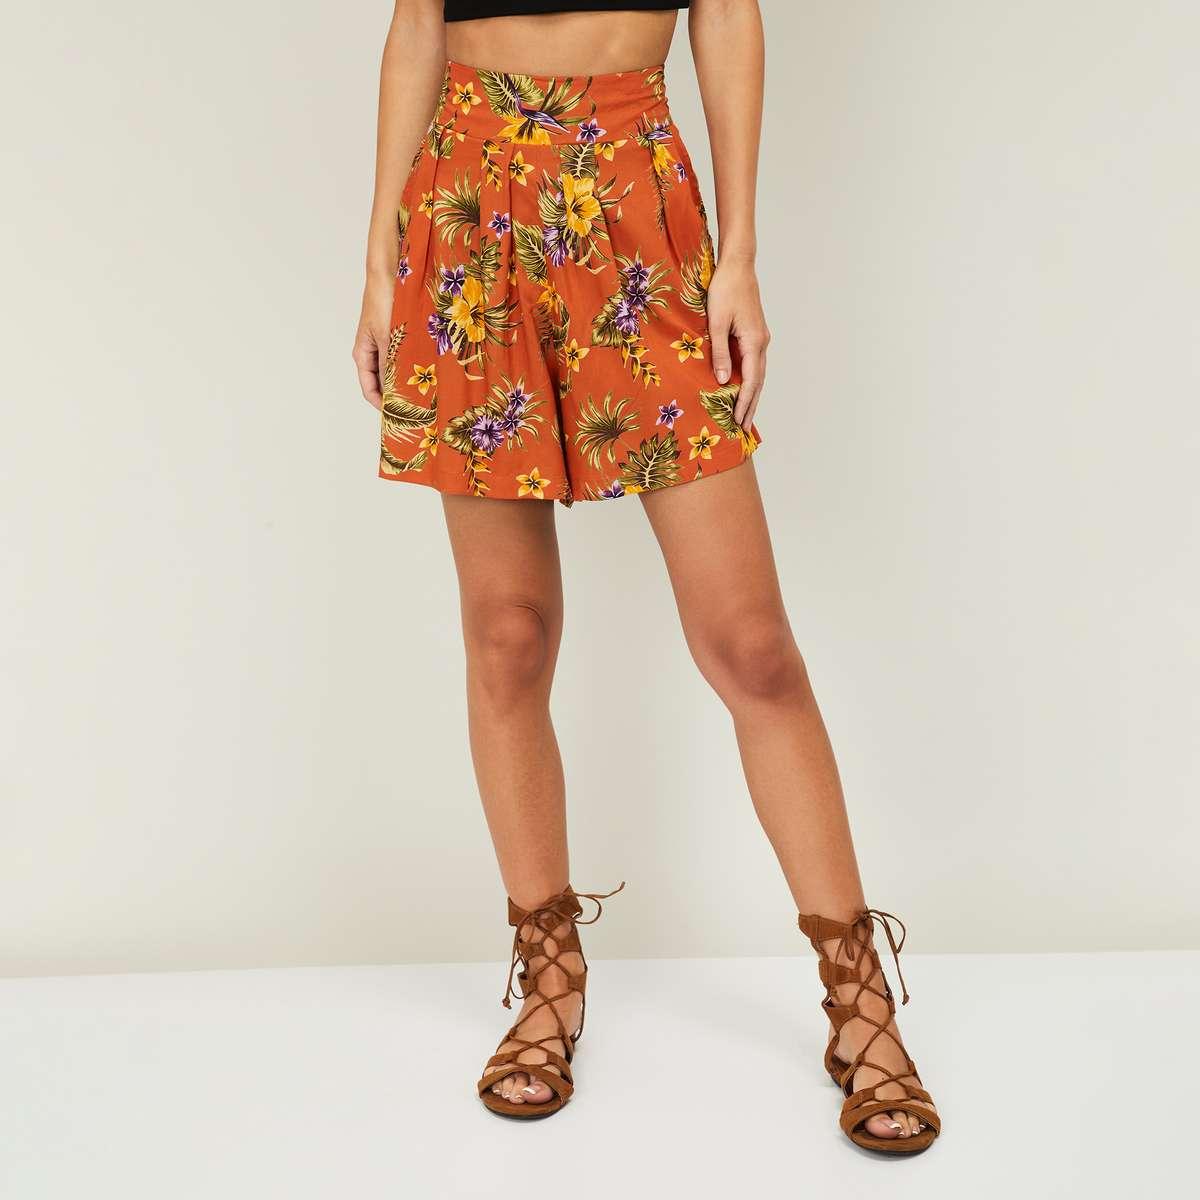 GINGER Women Floral Print Shorts